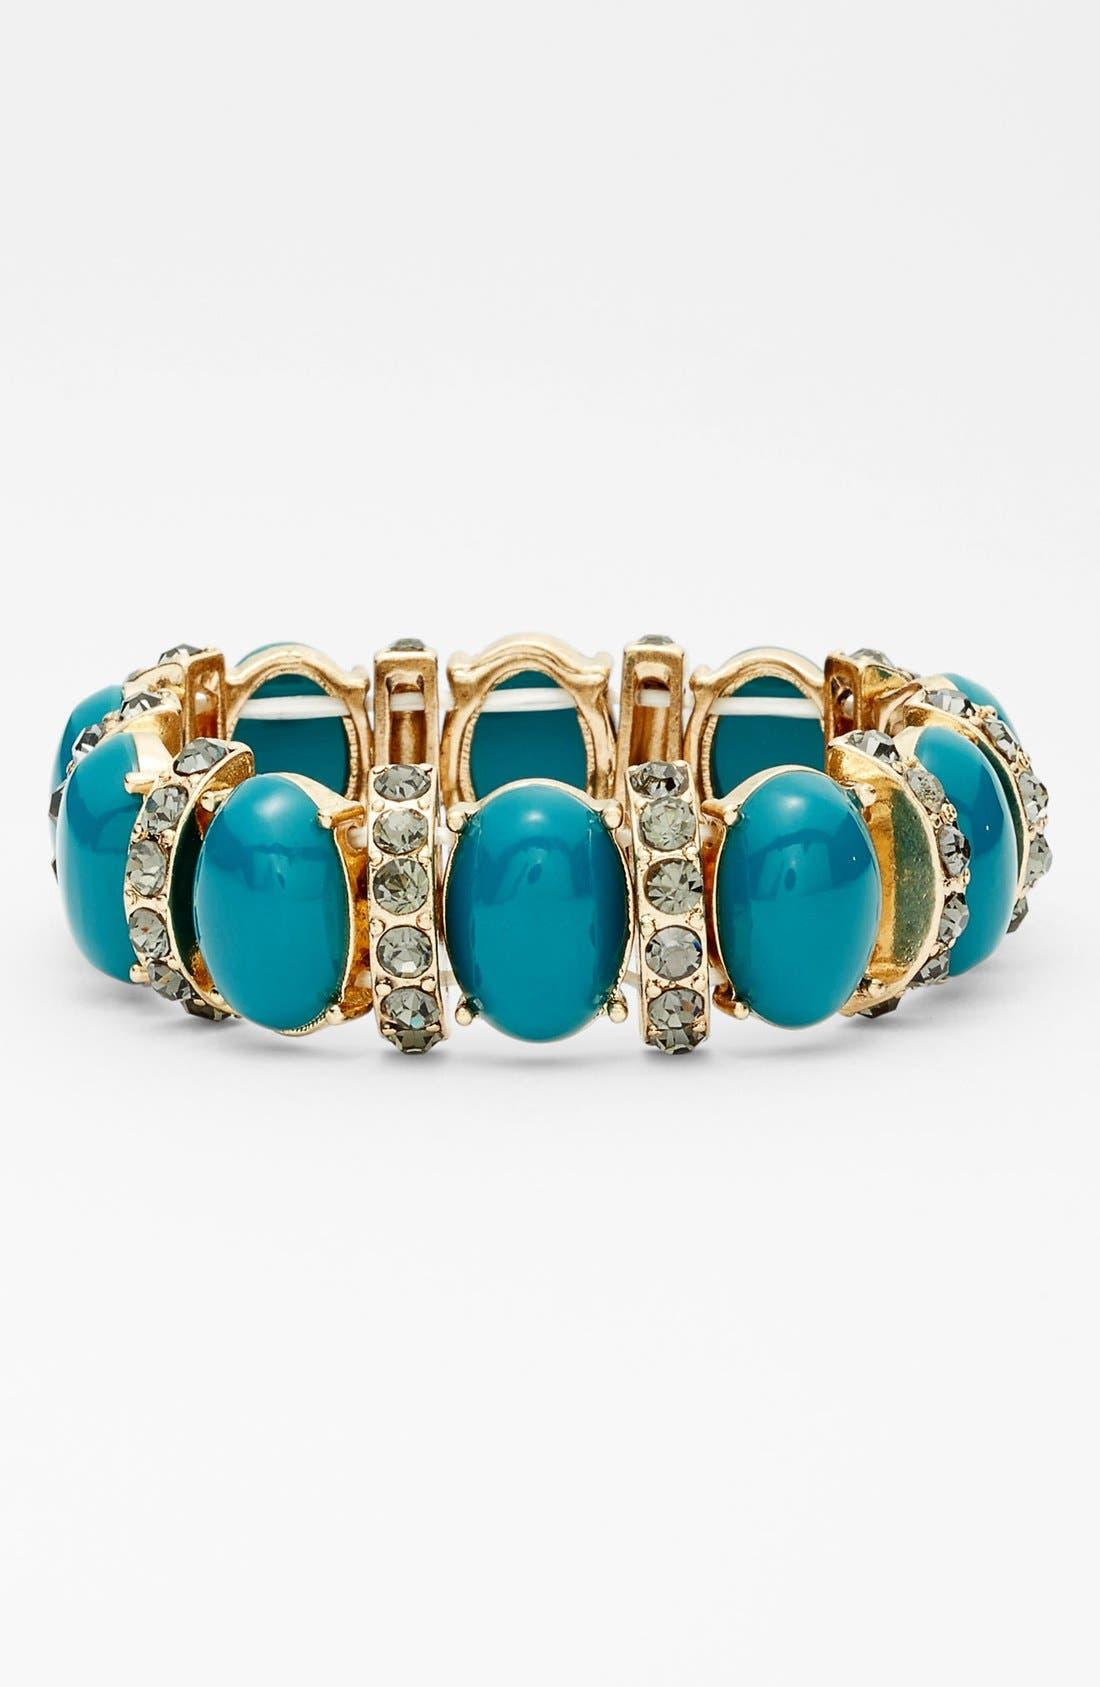 Main Image - Tasha Oval Stone & Crystal Bar Stretch Bracelet